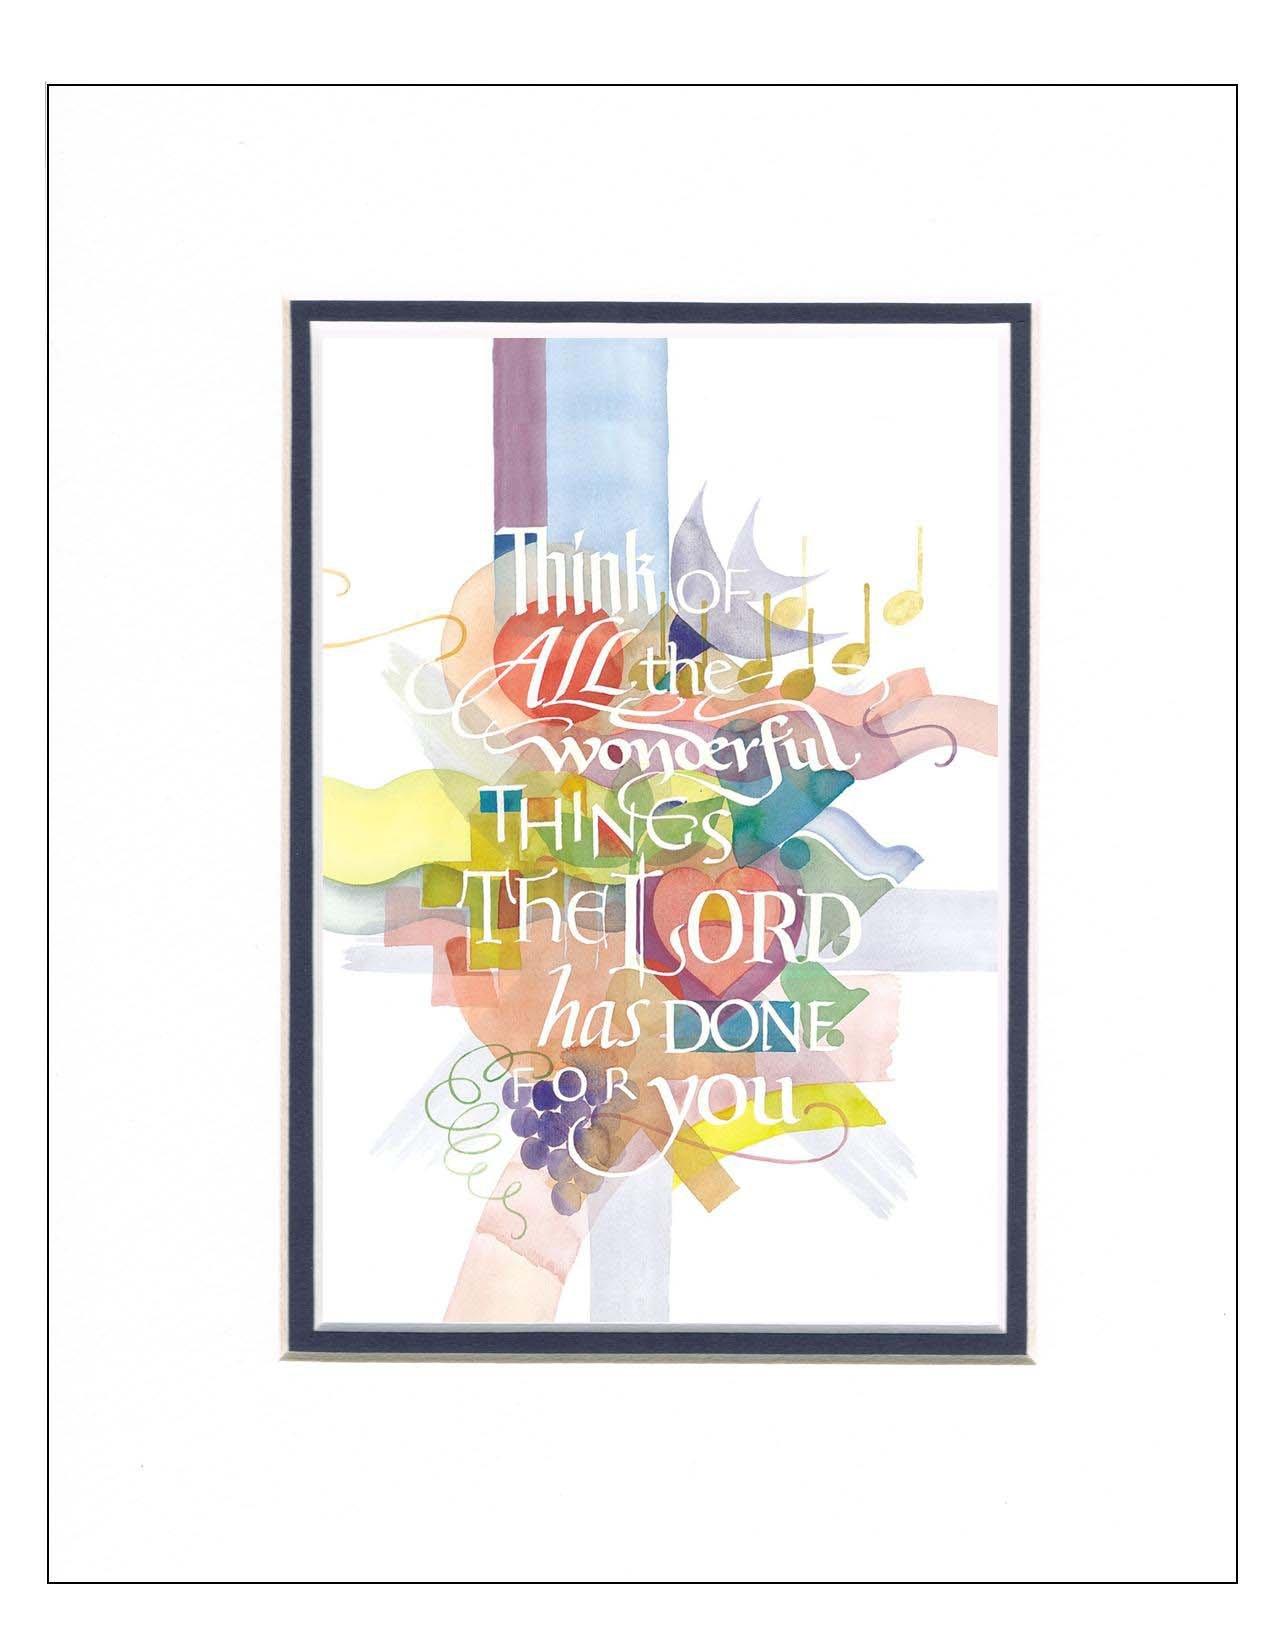 Tim Botts Calligraphy Fine Art Prints Framed Amp Matted